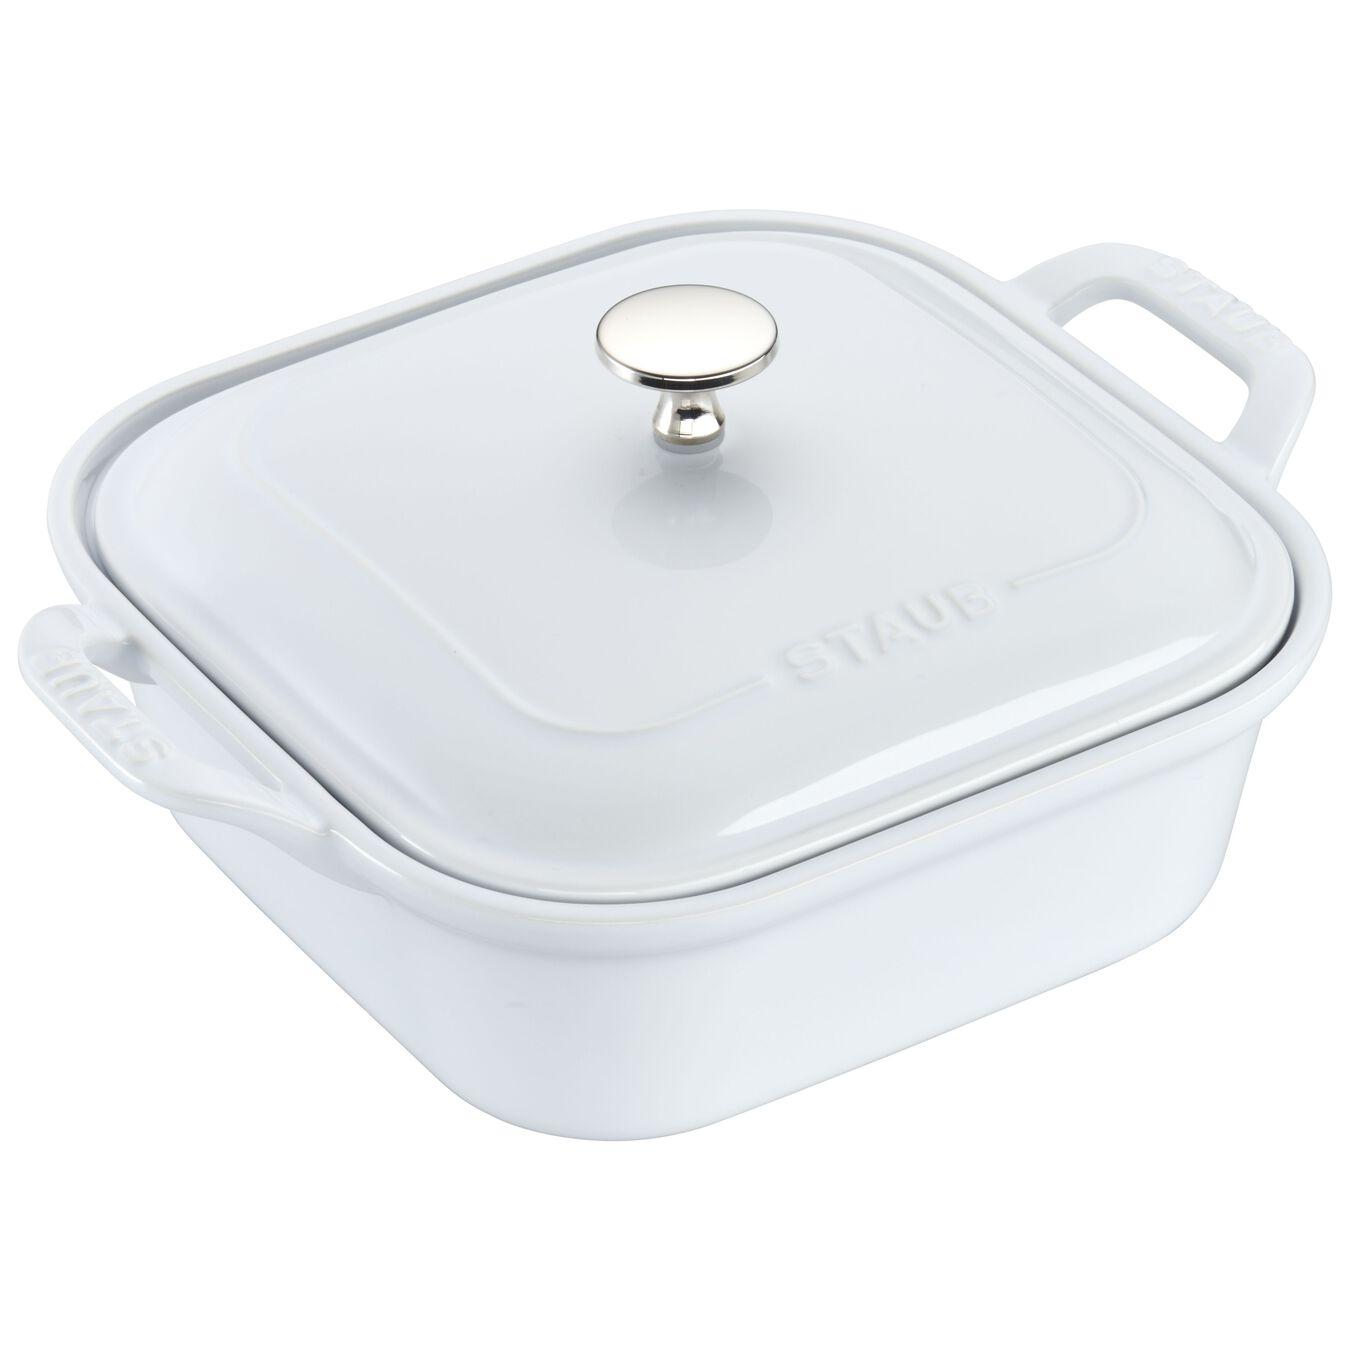 Ovenware set, 4 Piece | white,,large 2